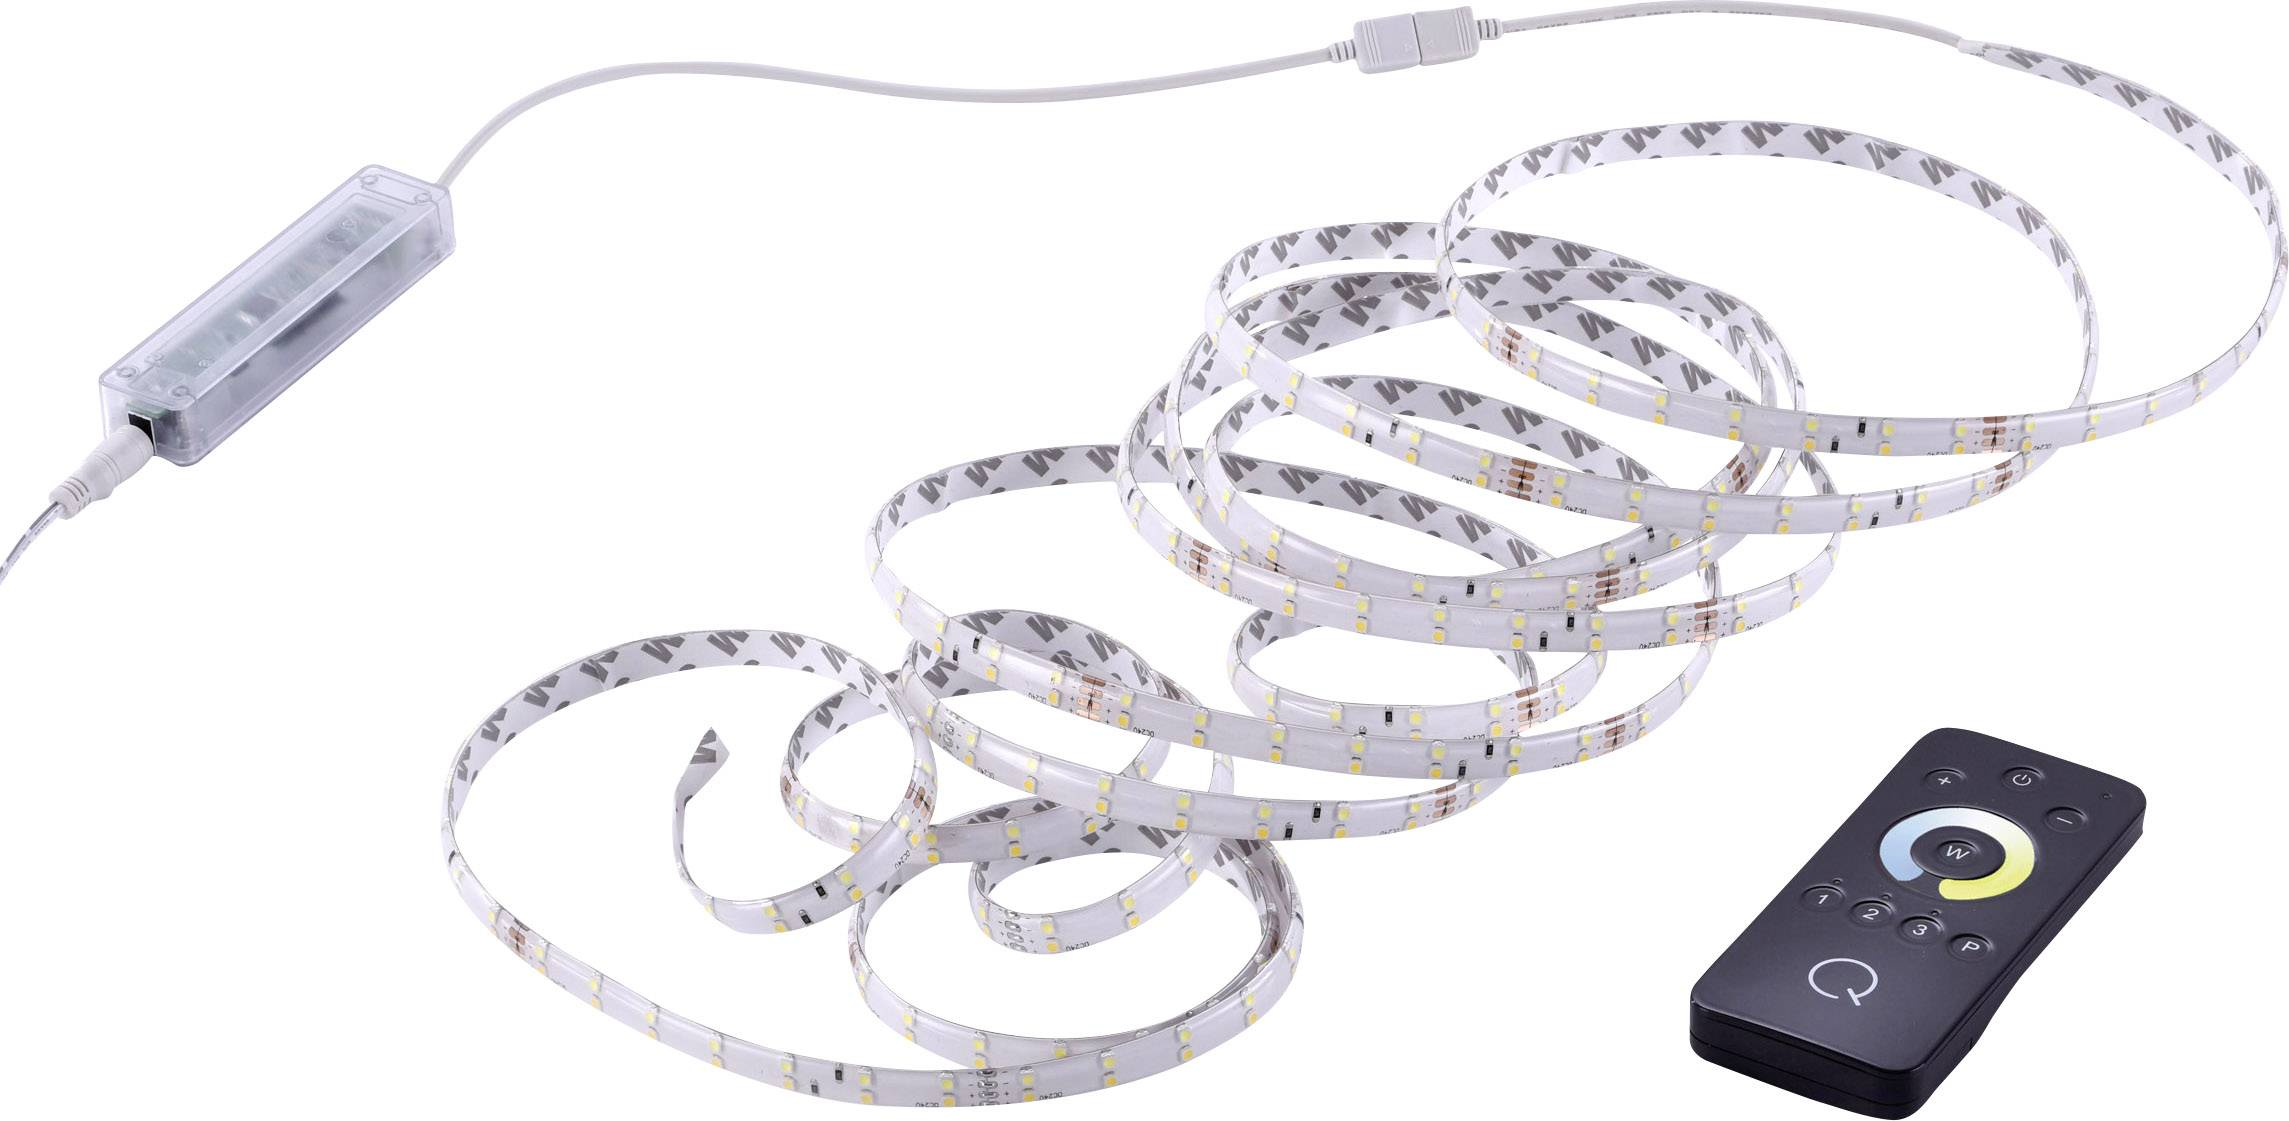 LED pásek s dálkovým olvadačem Paul Neuhaus Q®-Teania, pevně vestavěné LED, 25 W, teplá bílá, RGB